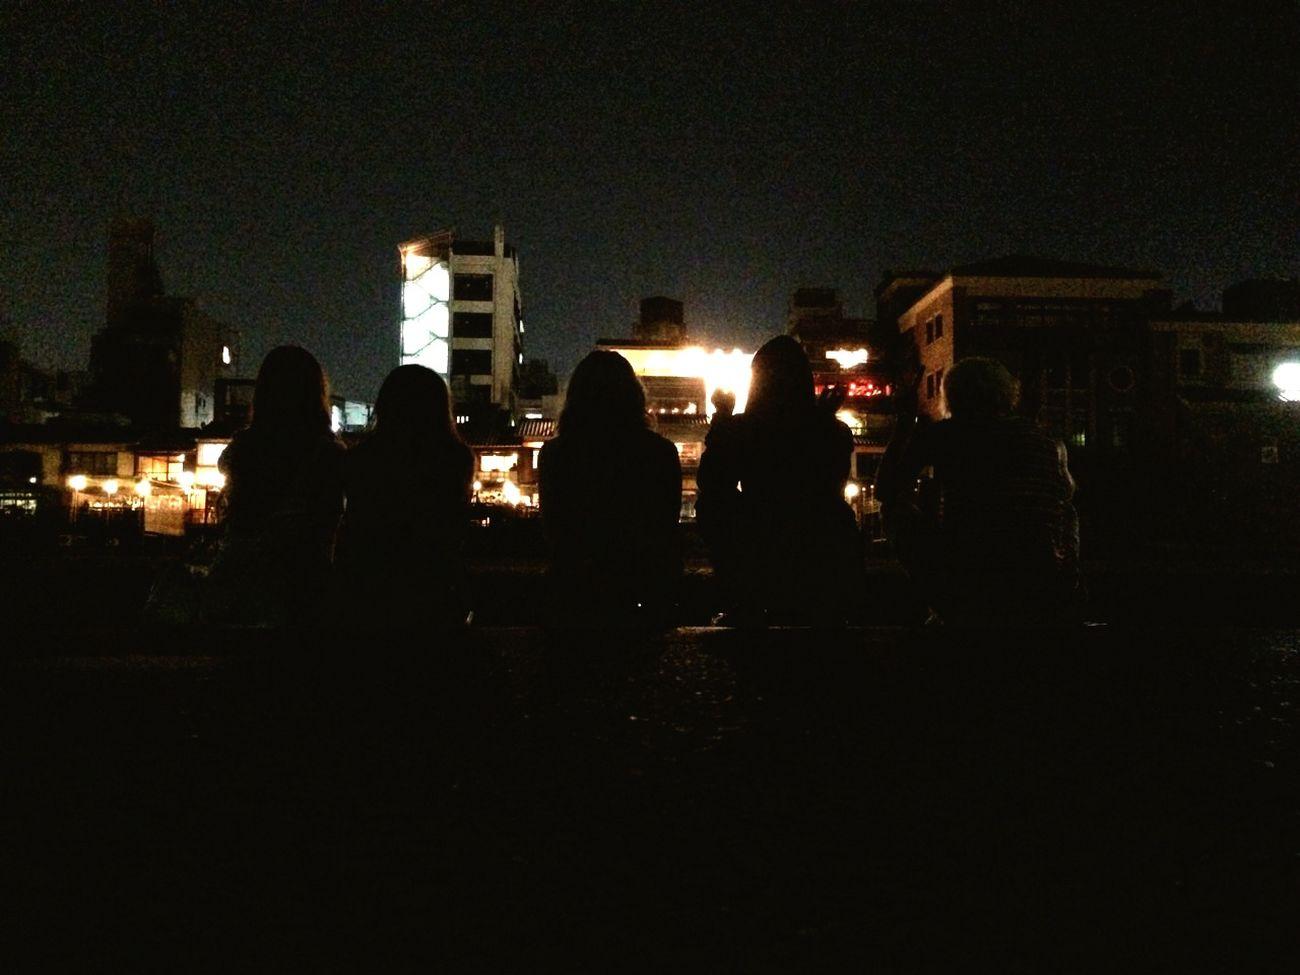 Barefoot 五人の人影と 夜の風景